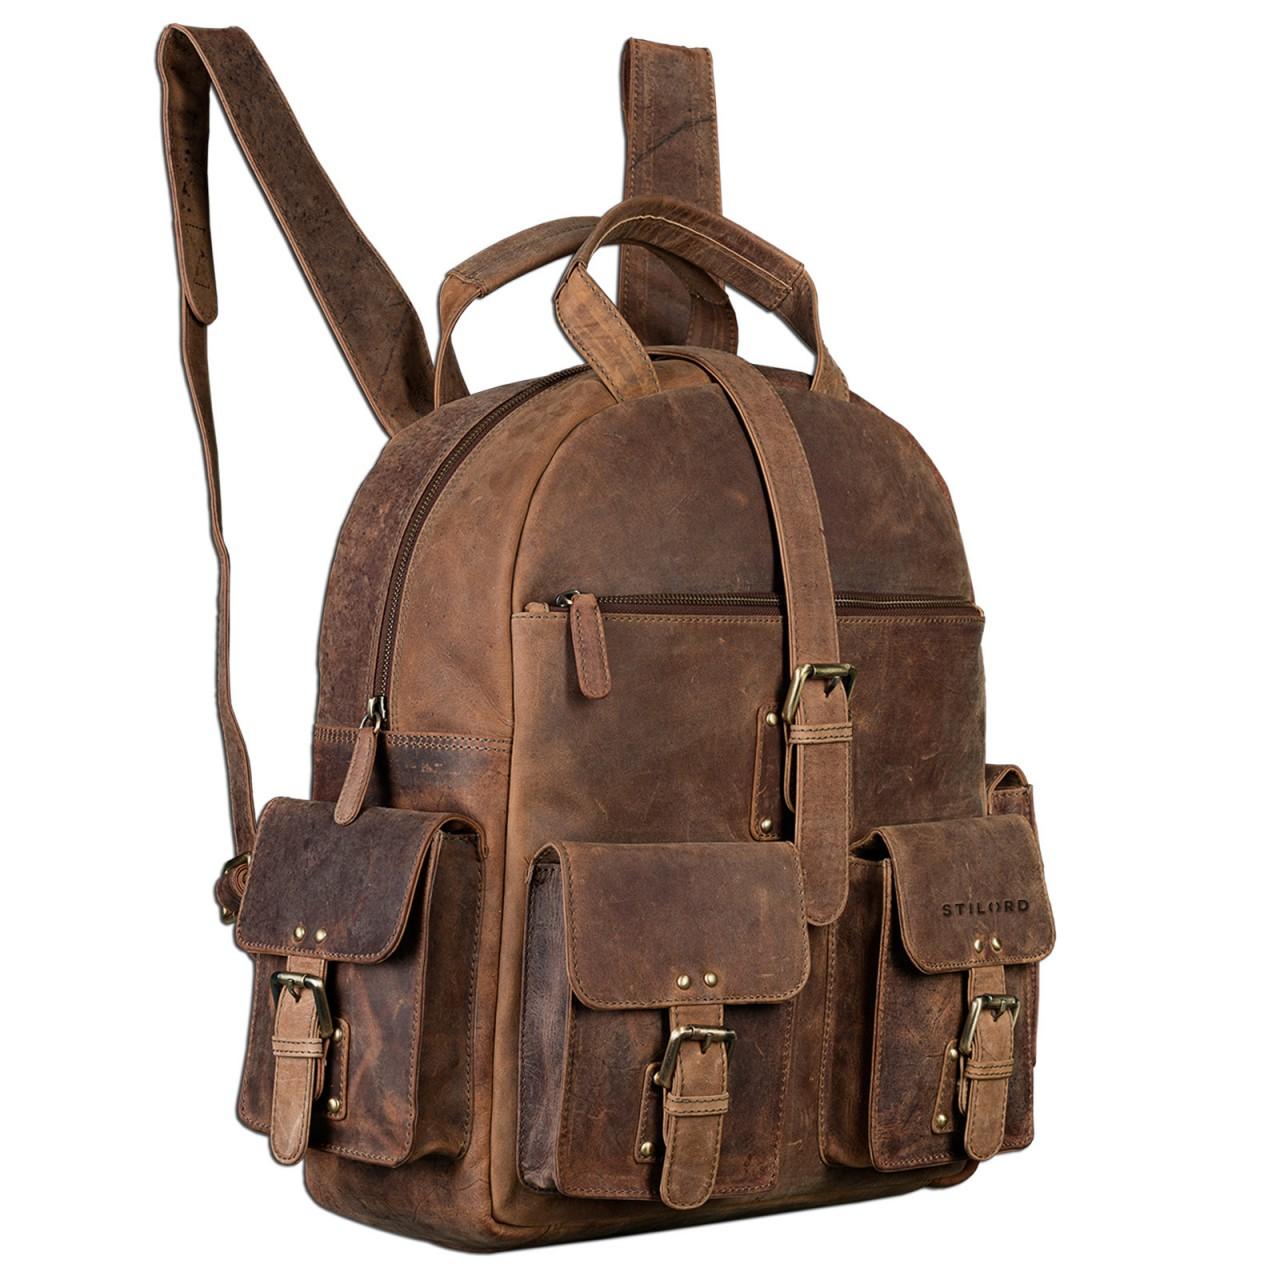 "STILORD ""Nevada"" Rucksack Leder groß im Vintage Design mit 13,3 Zoll Laptopfach Unisex Lederrucksack Uni Schule Lehrer Echtleder  - Bild 2"